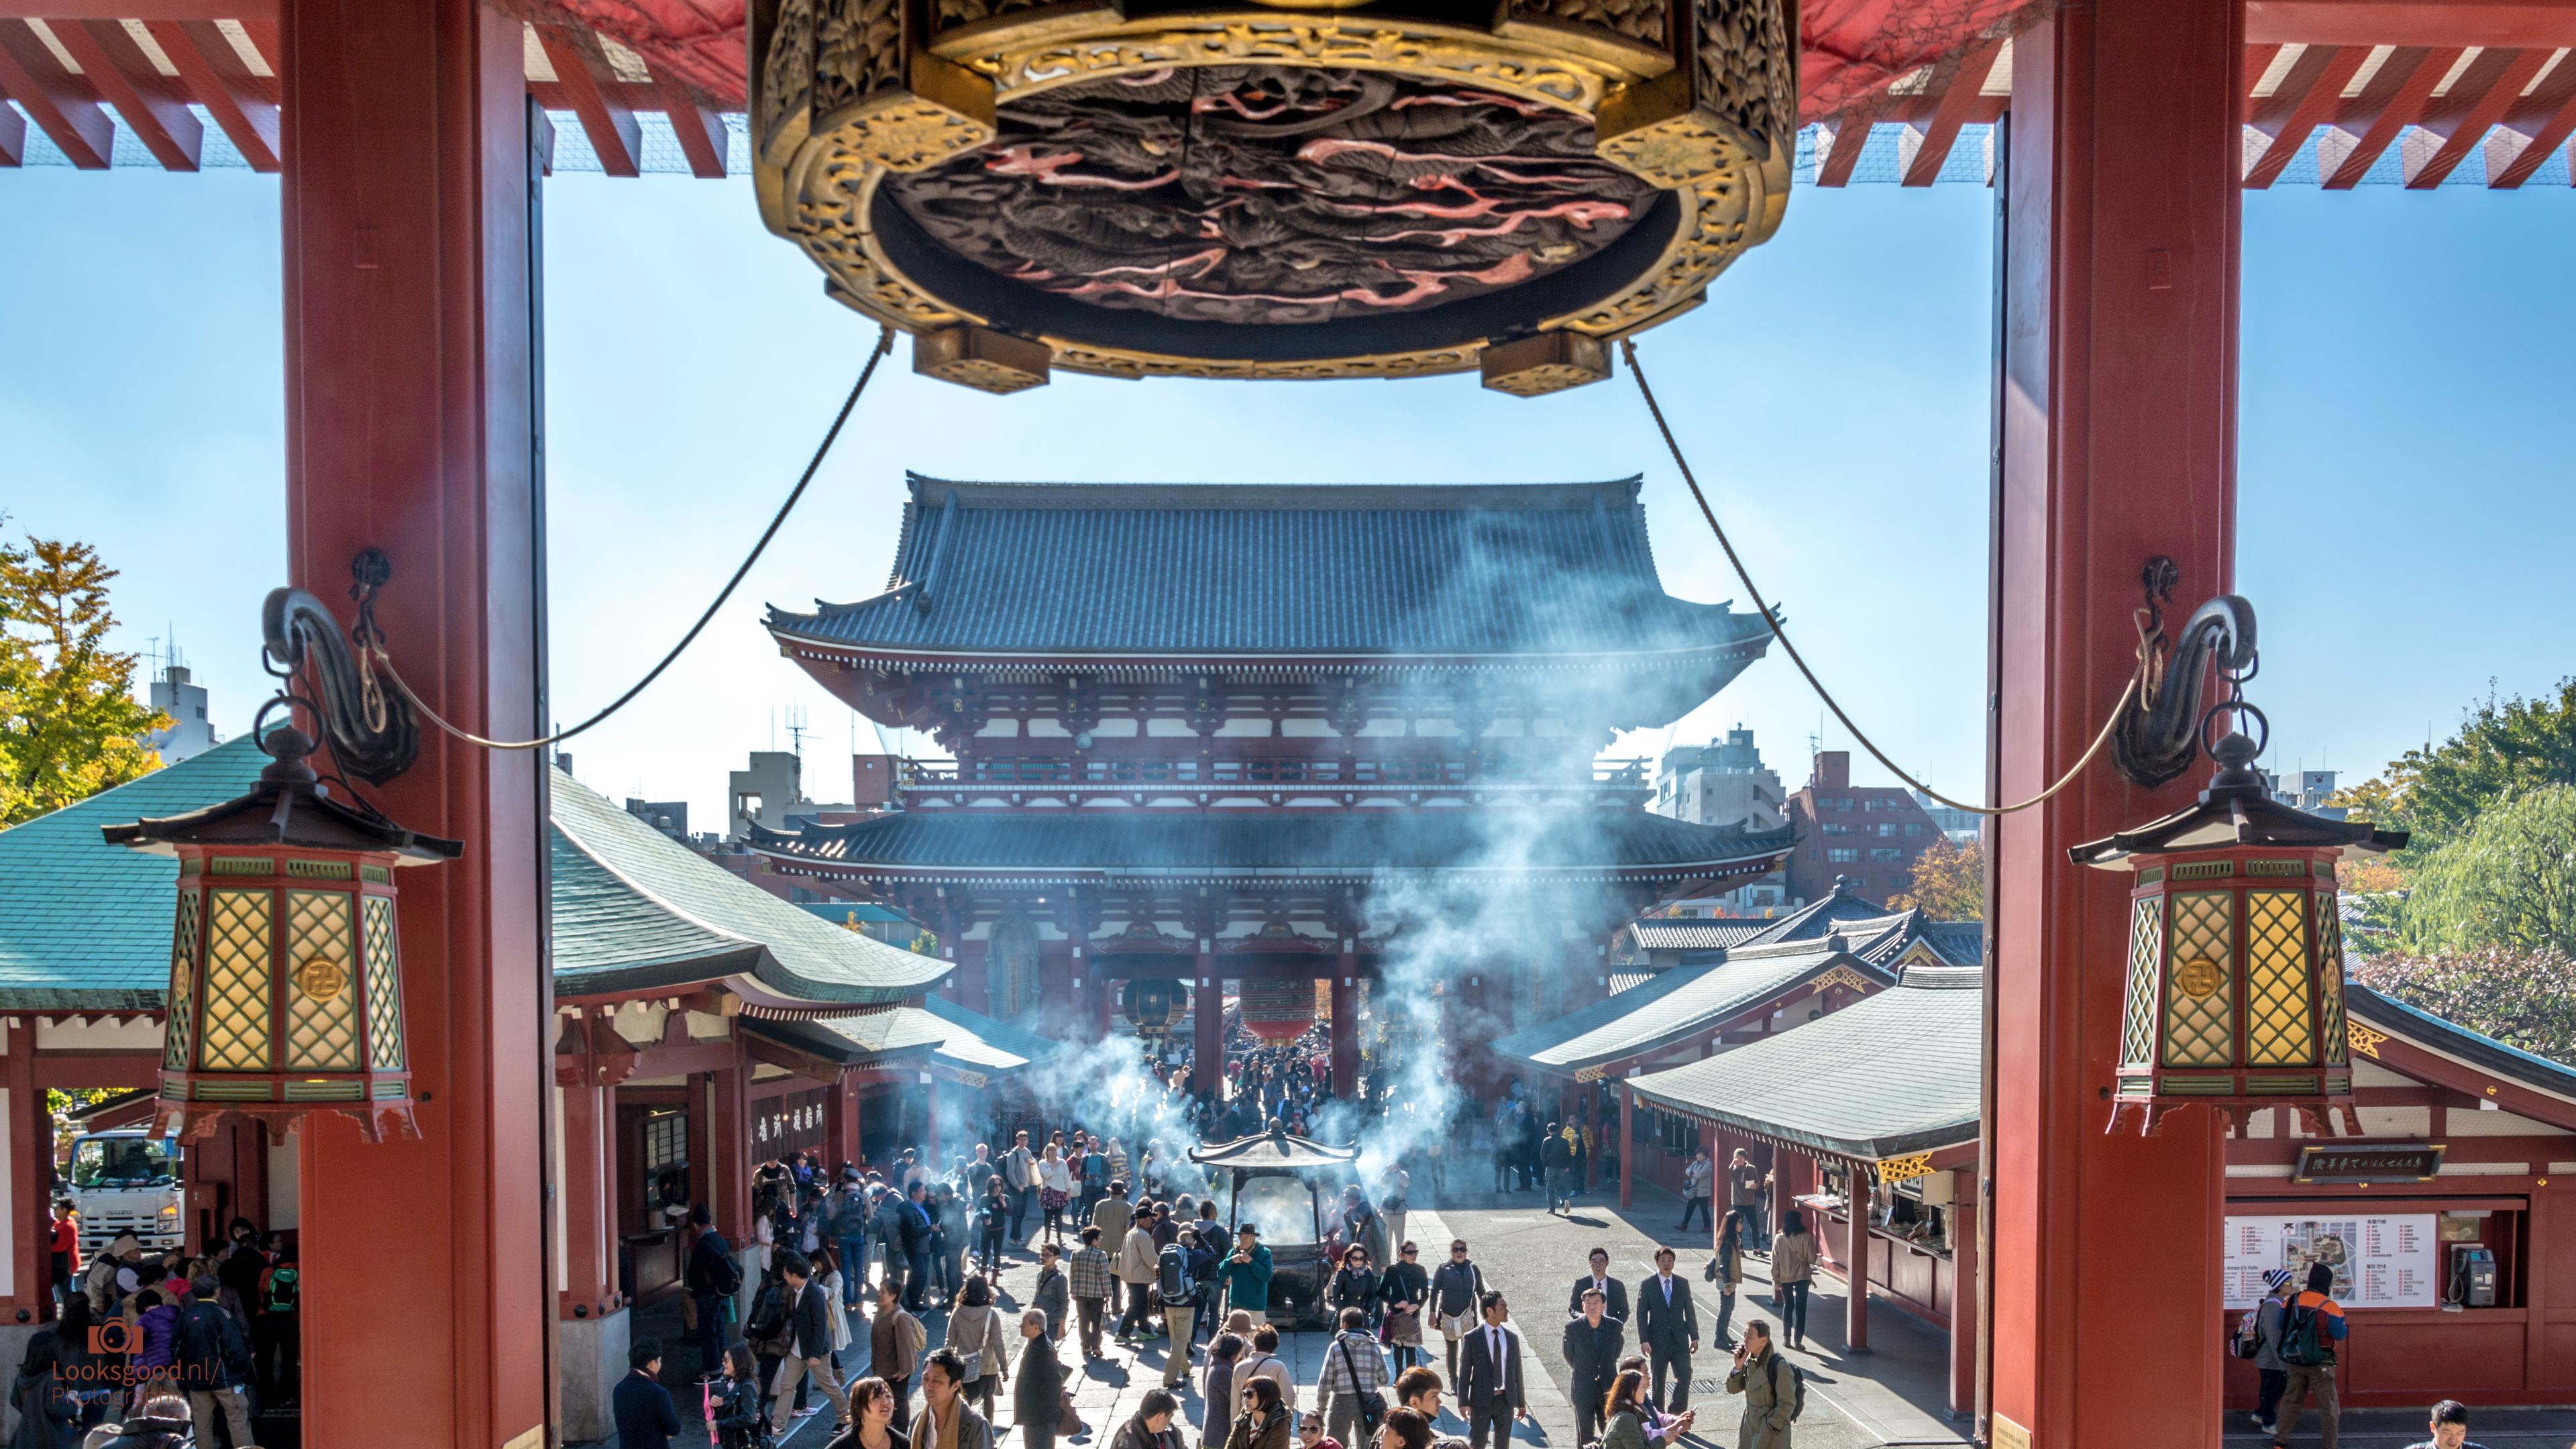 Asakusa Temple Tokyo Japan 4K Wallpaper Desktop Background Flickr 3840x2160